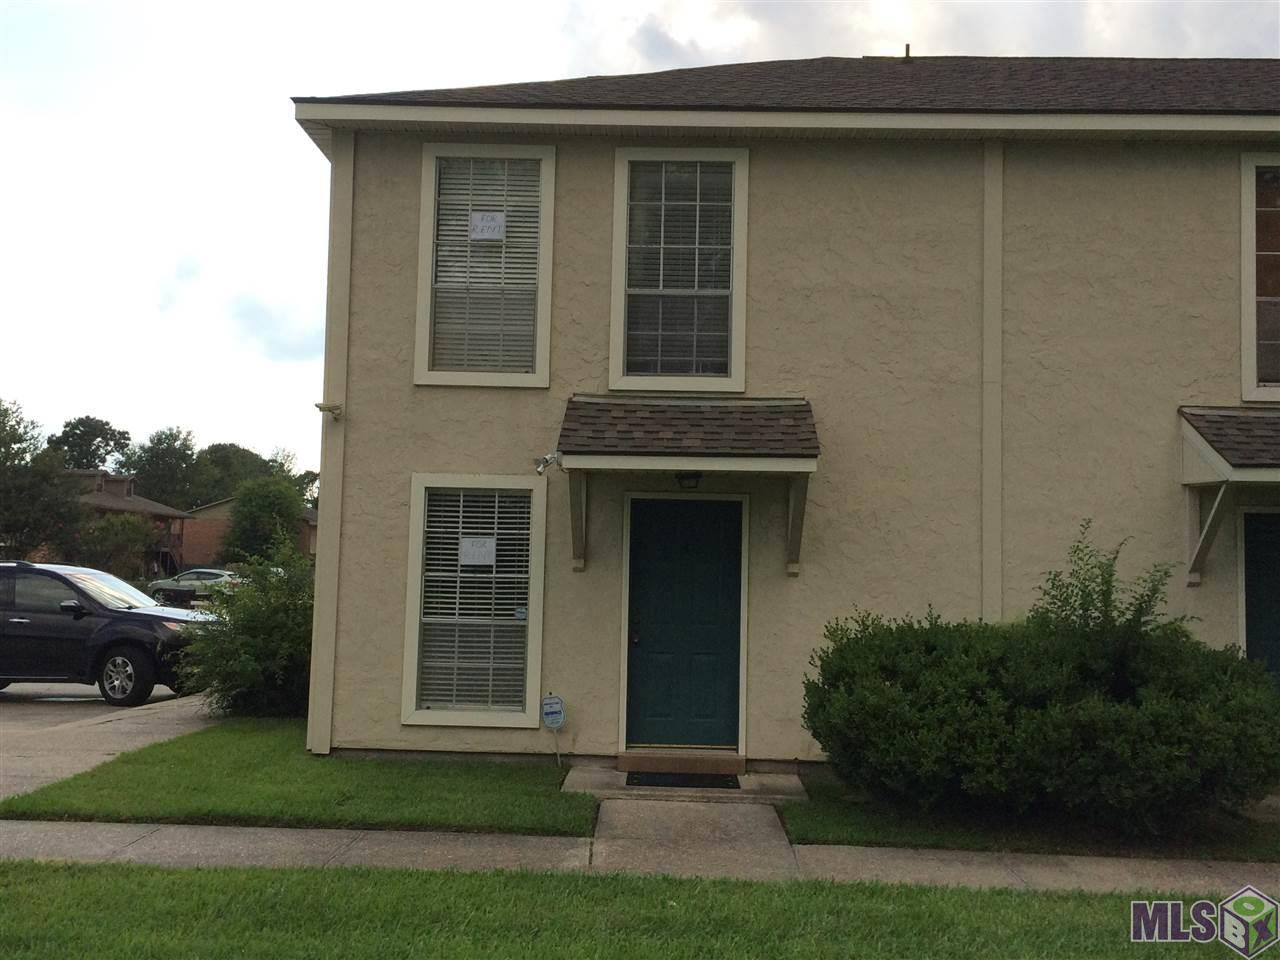 522 S FLANNERY RD A, Baton Rouge, LA 70815